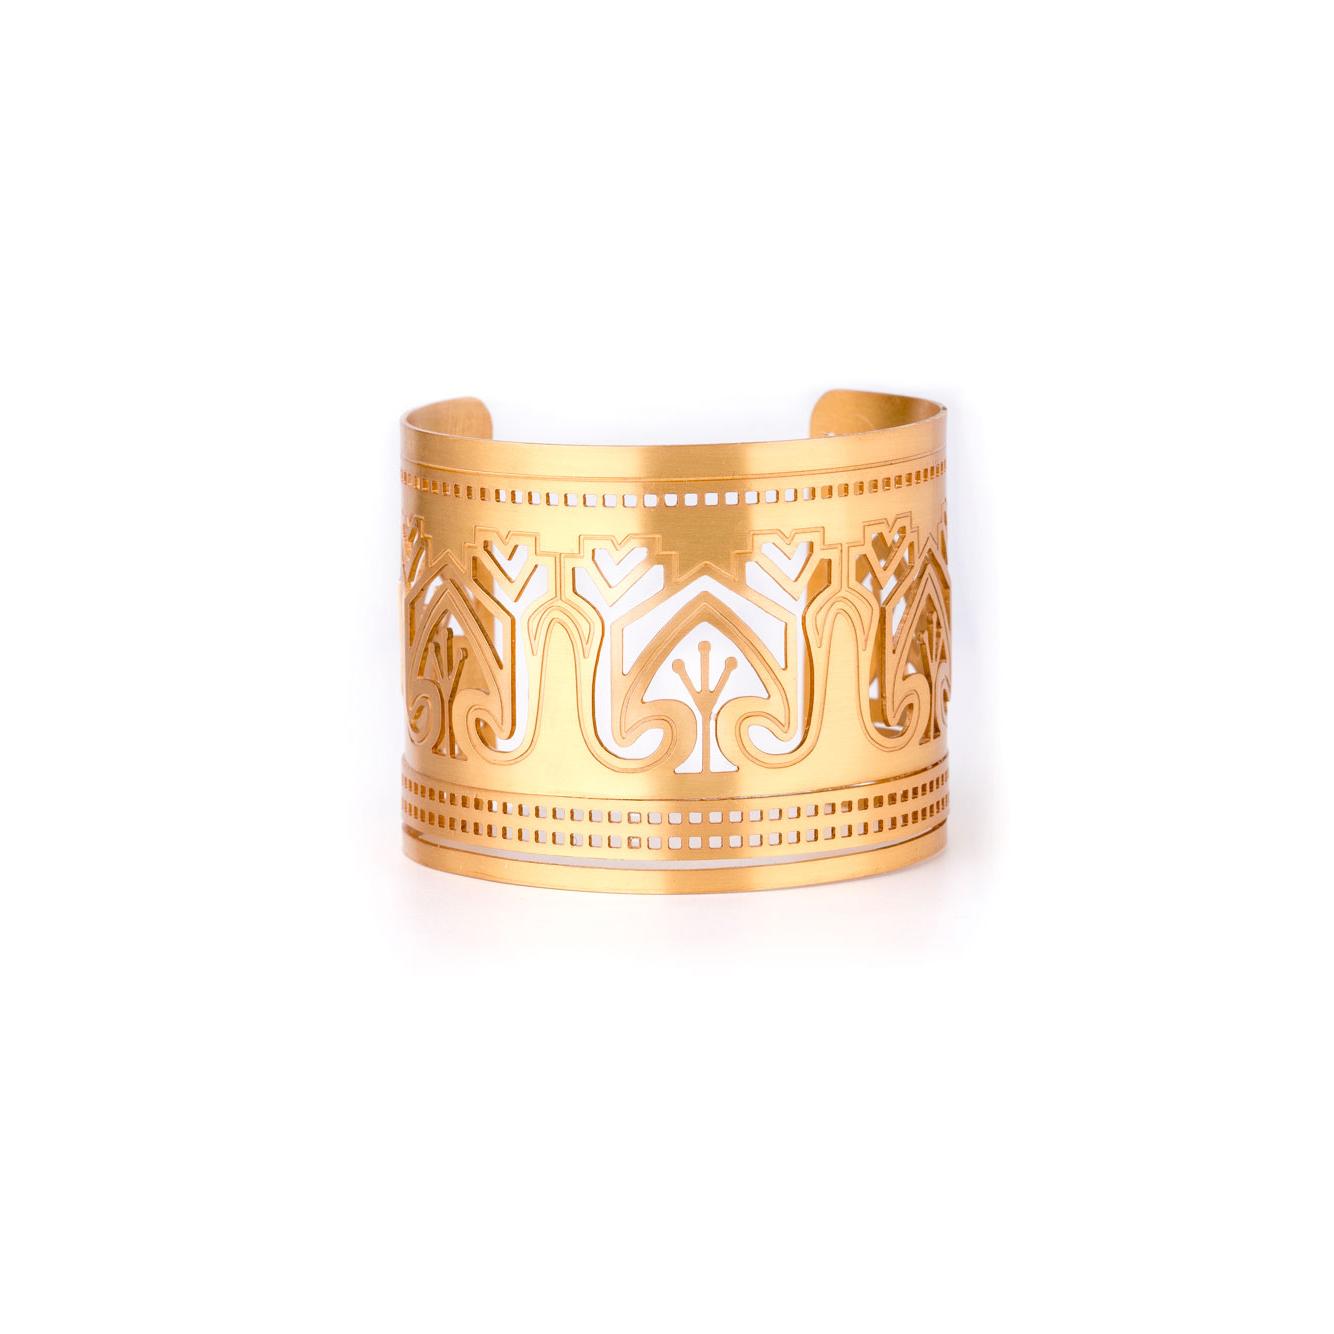 ethos-bilitziki-bracelet